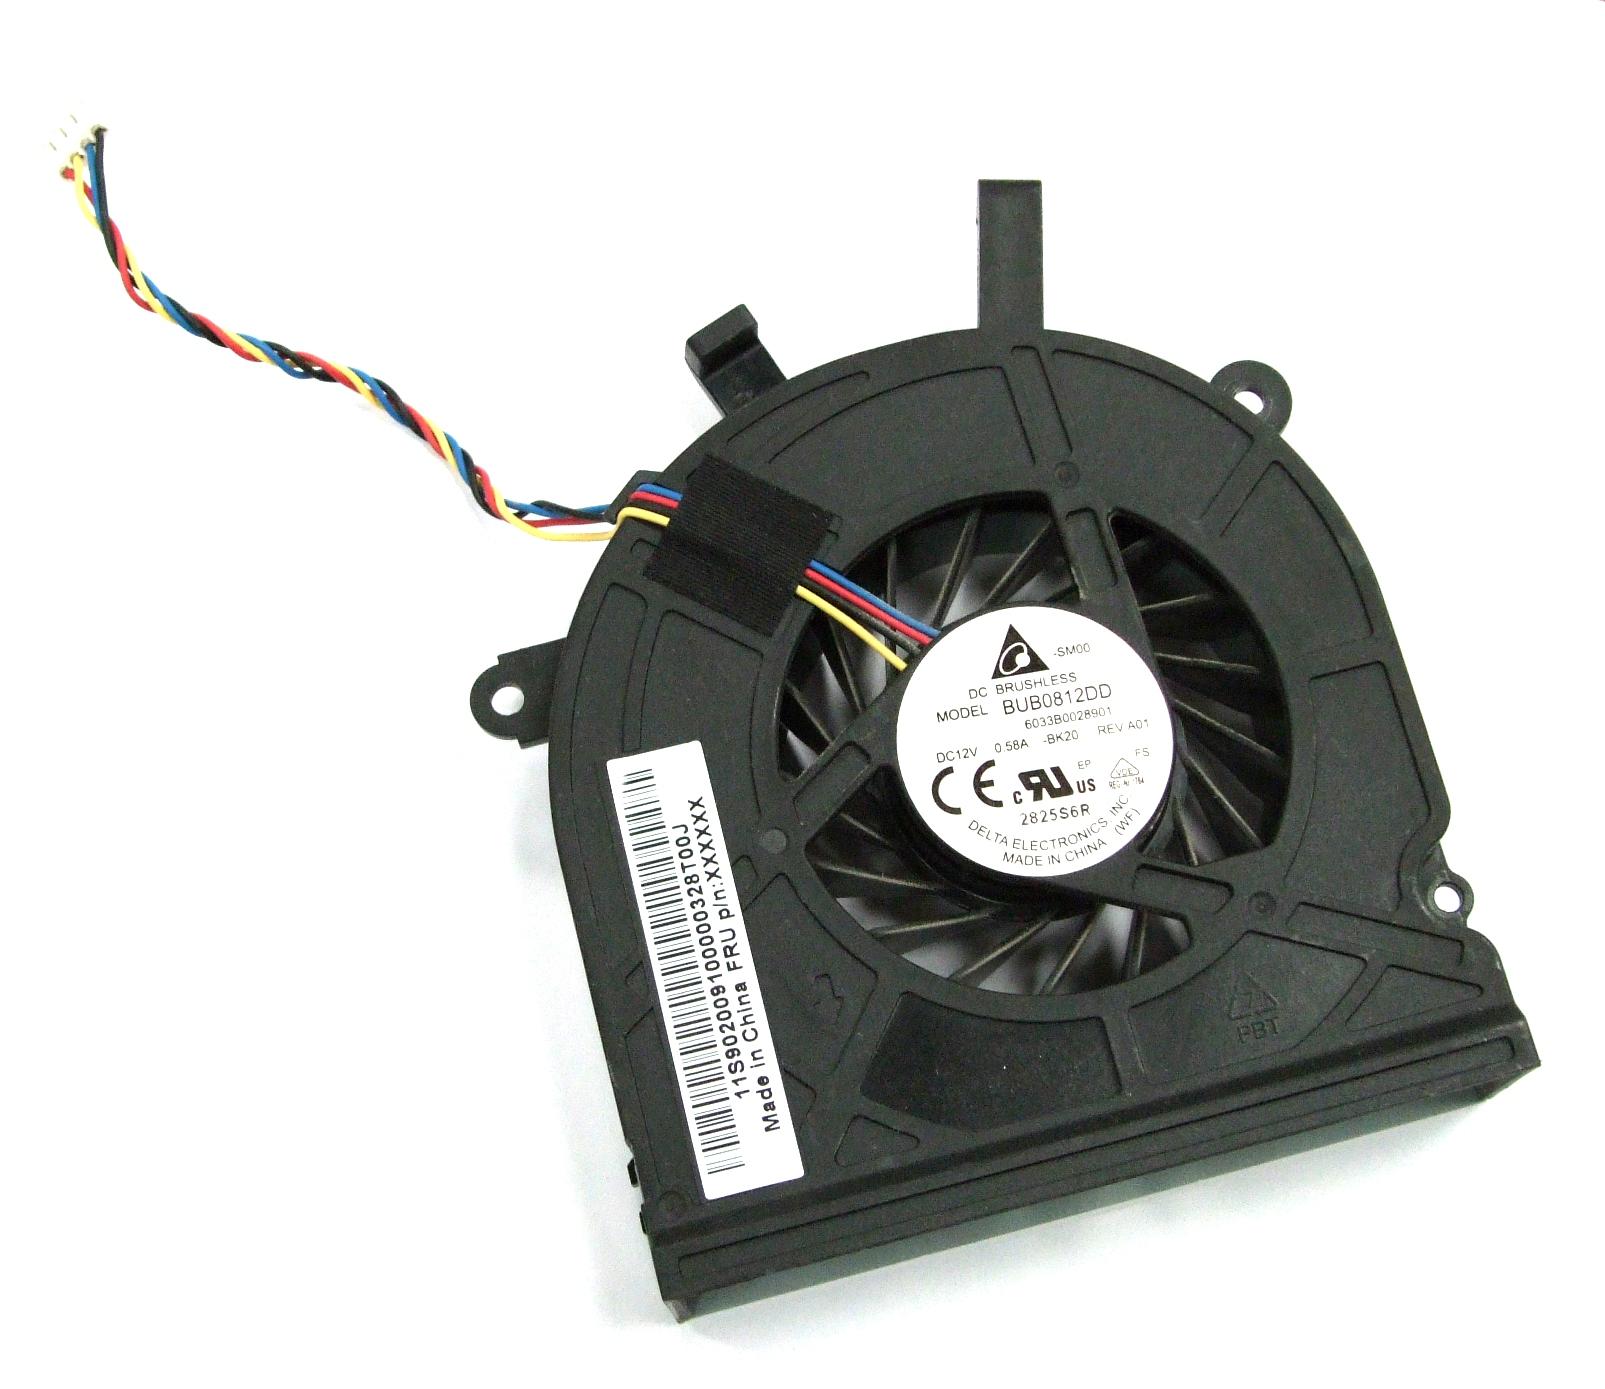 Electronic Cooling Fans : Bub dd bk delta electronics v a cooling fan